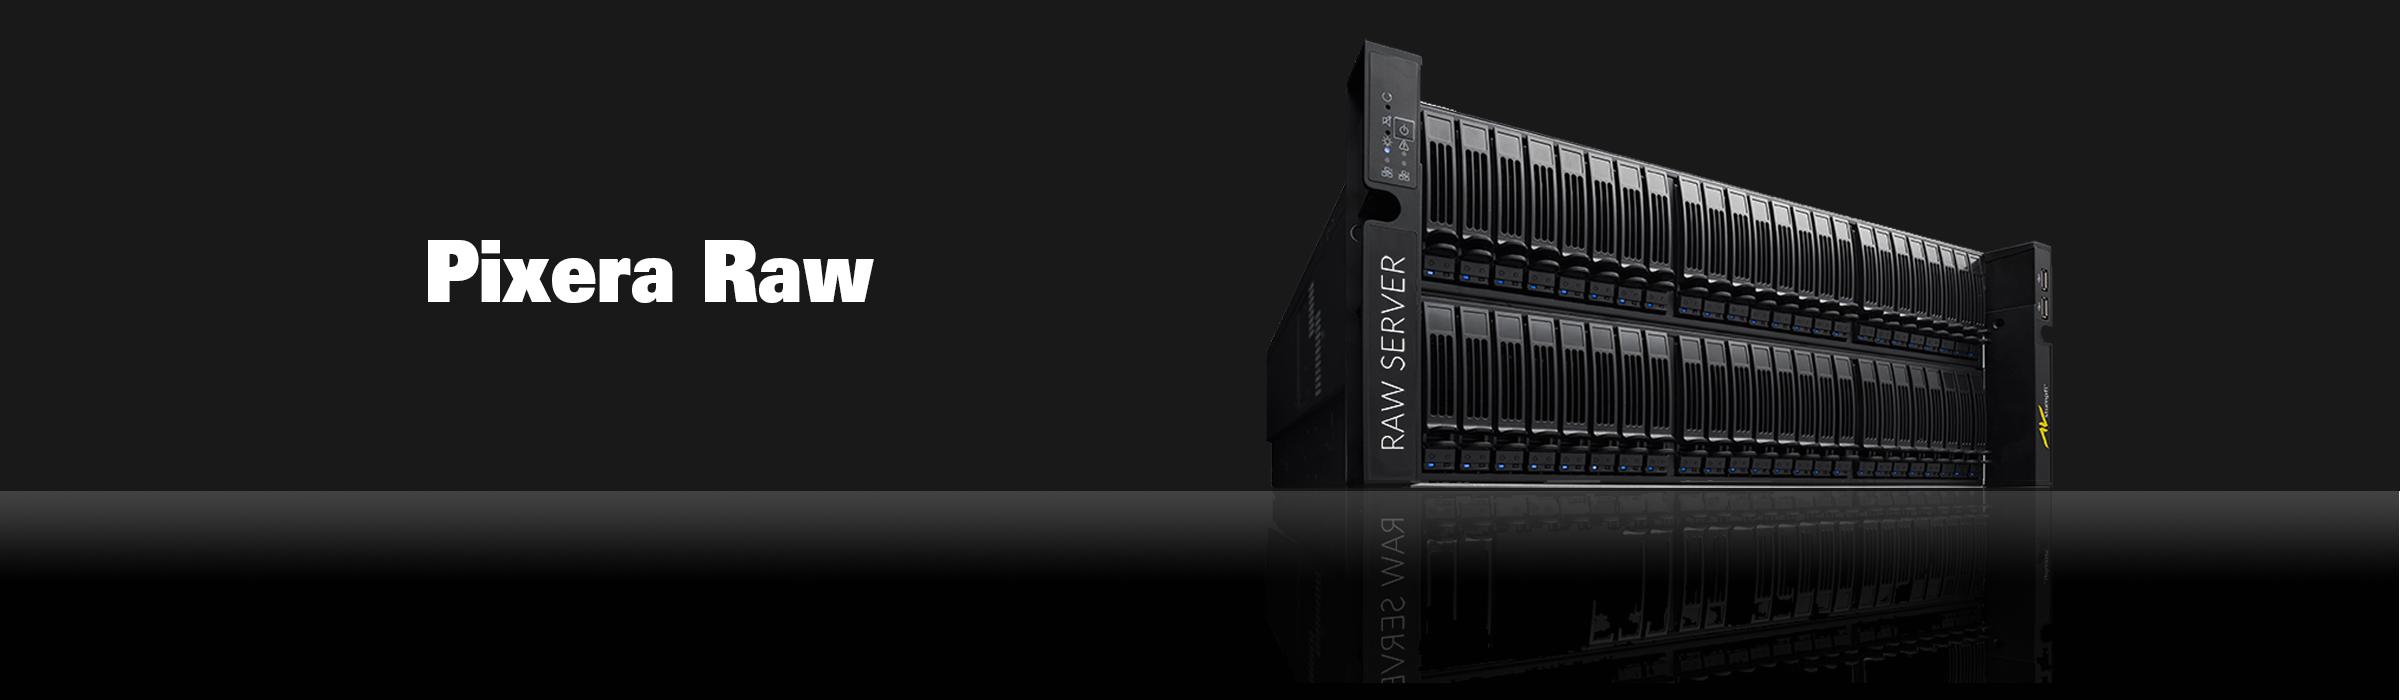 Pixaer RAW Server